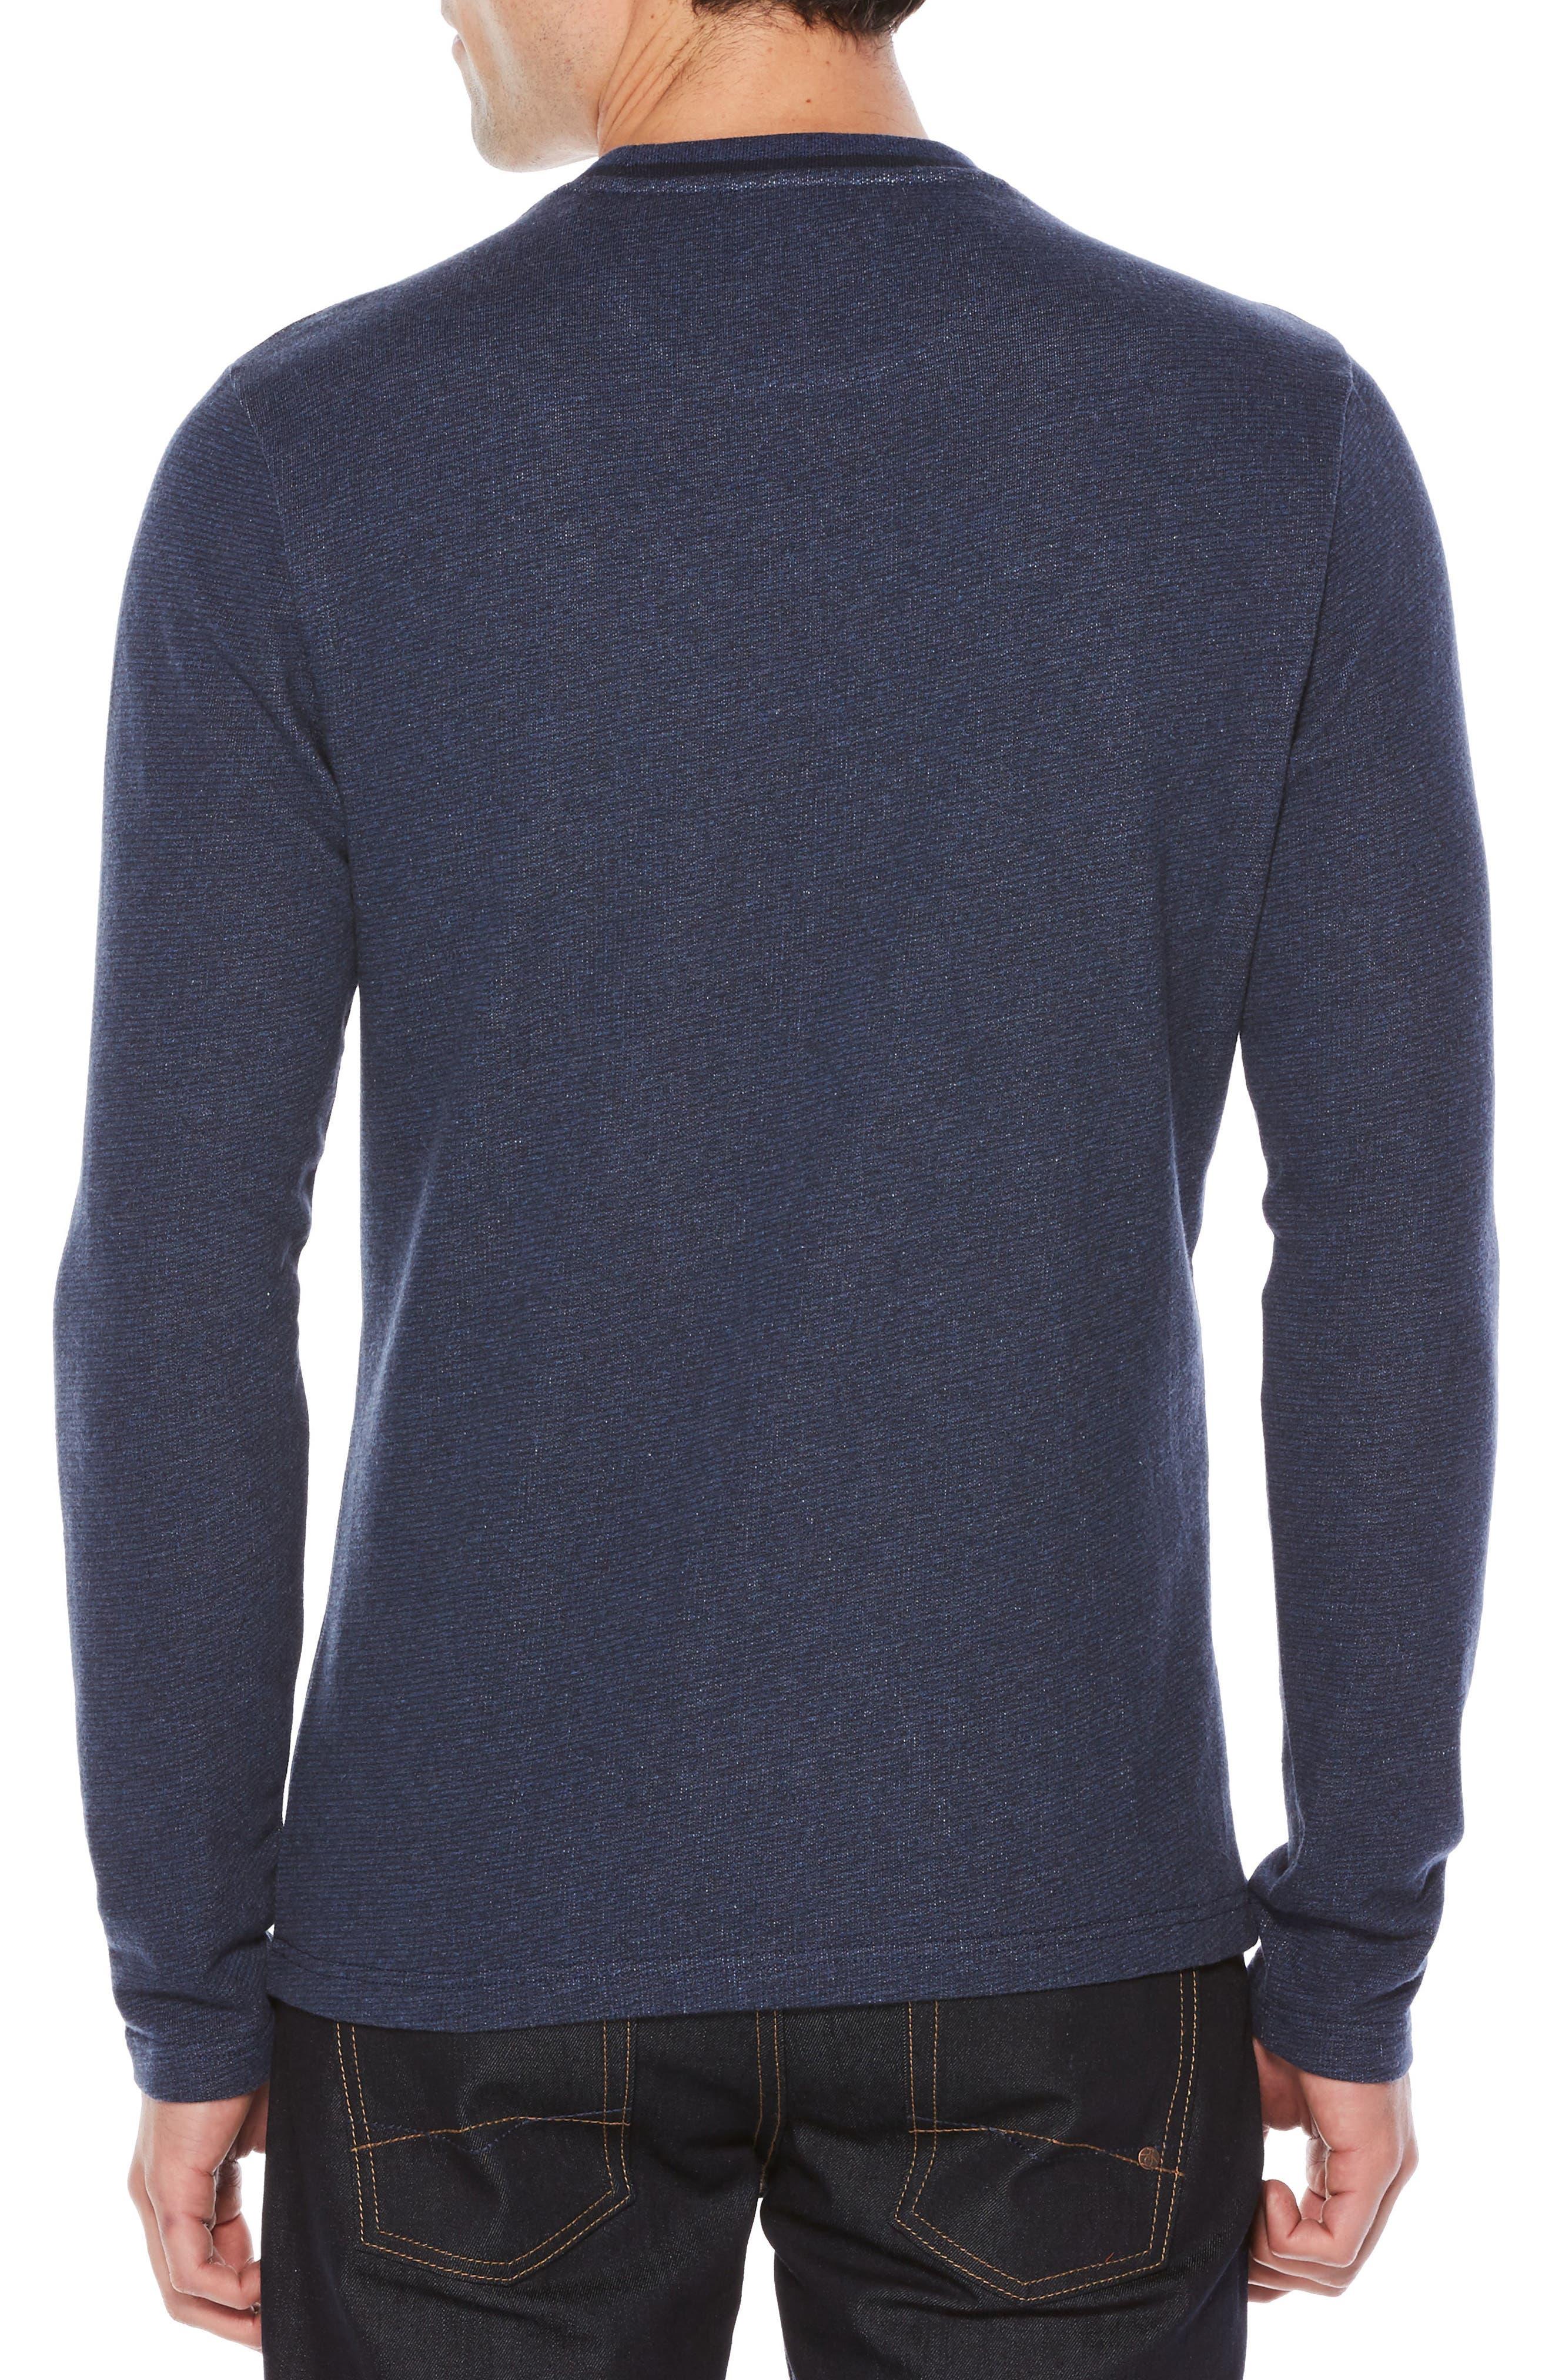 Jaspé Terry Long Sleeve T-Shirt,                             Alternate thumbnail 2, color,                             413